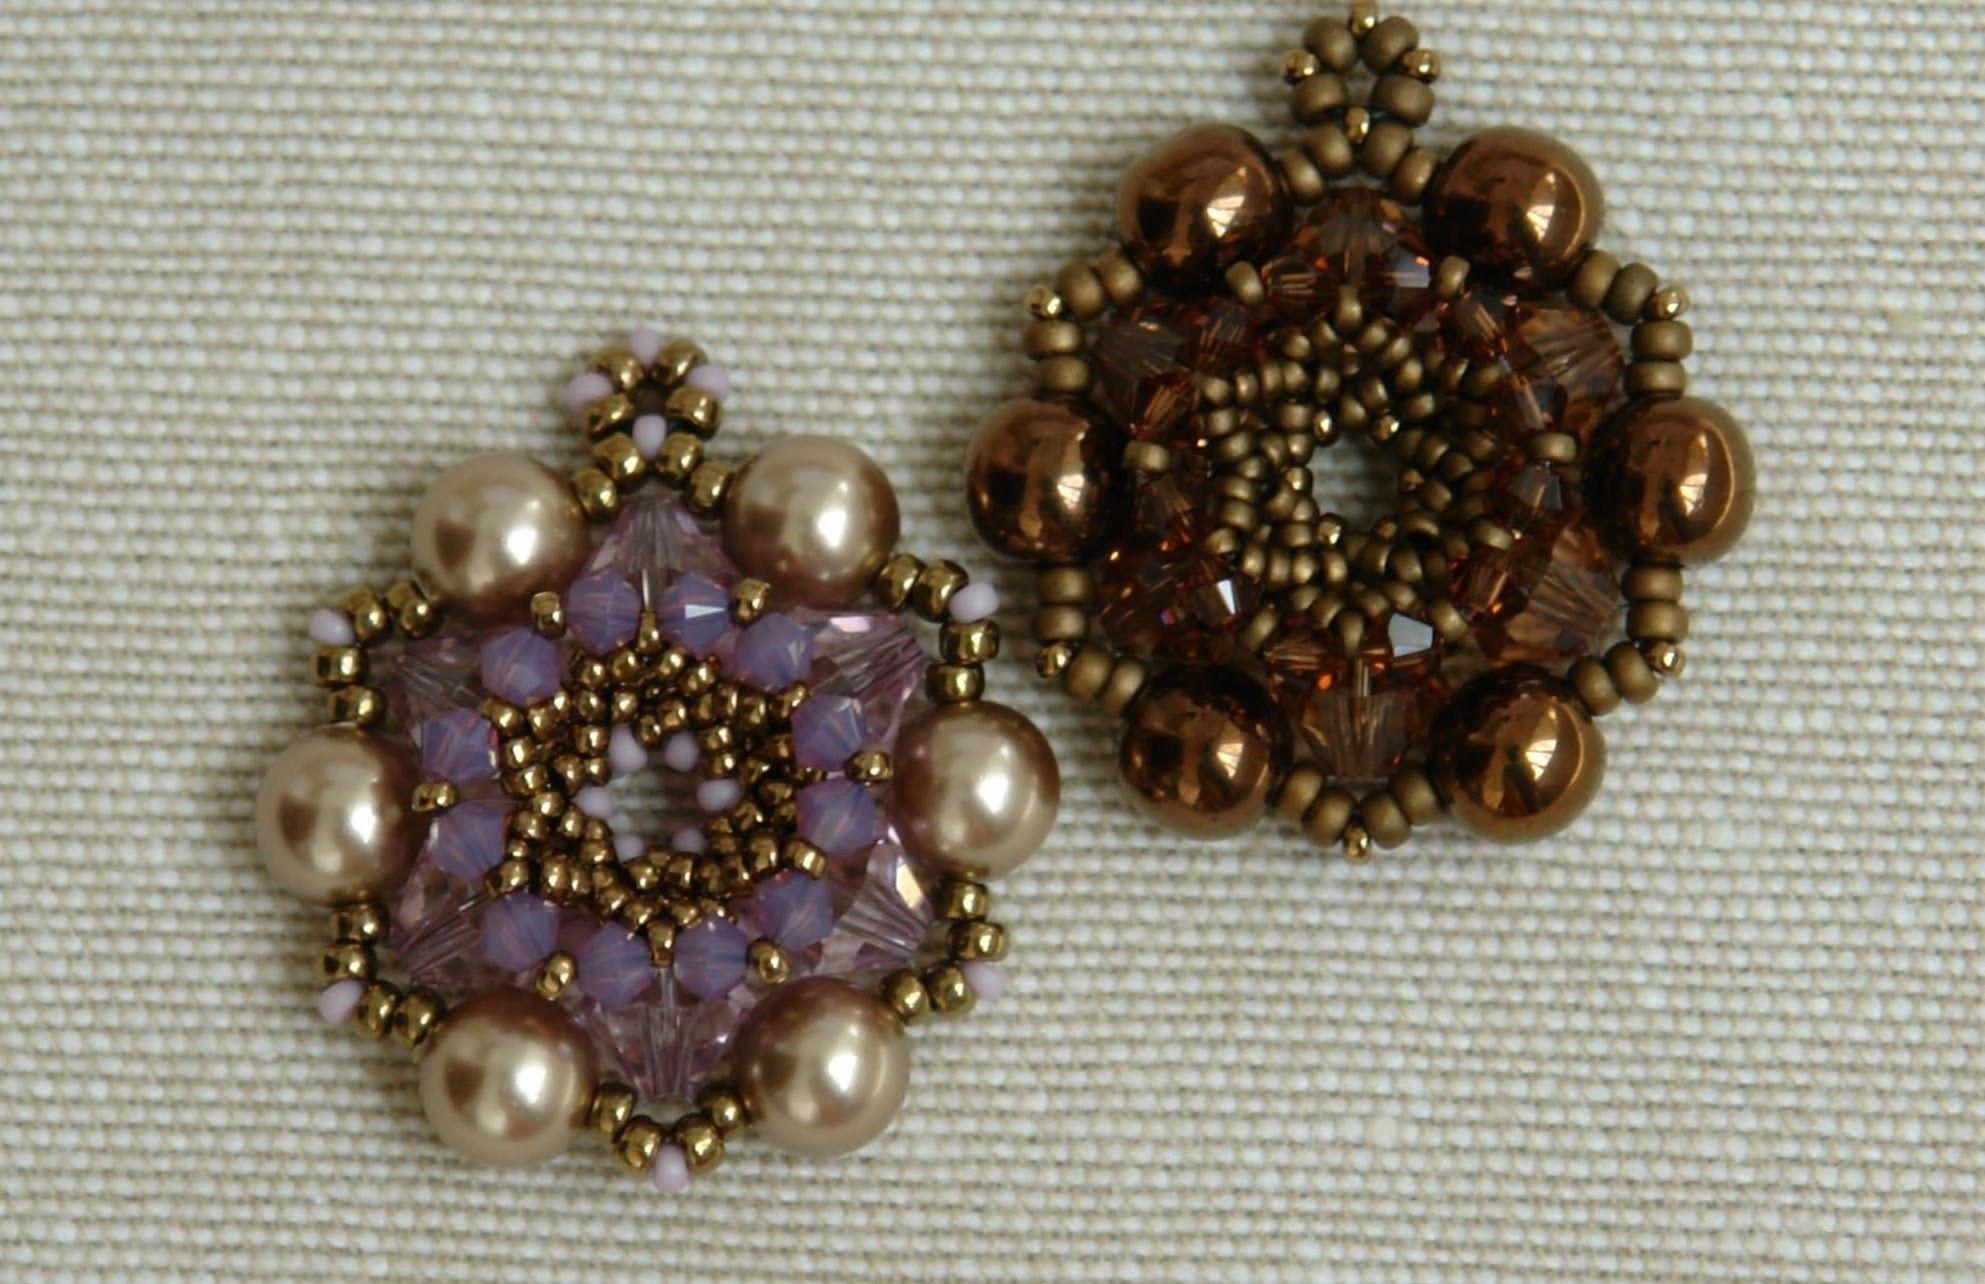 Sidonia's handmade jewelry - In Blossom Pendant tutorial